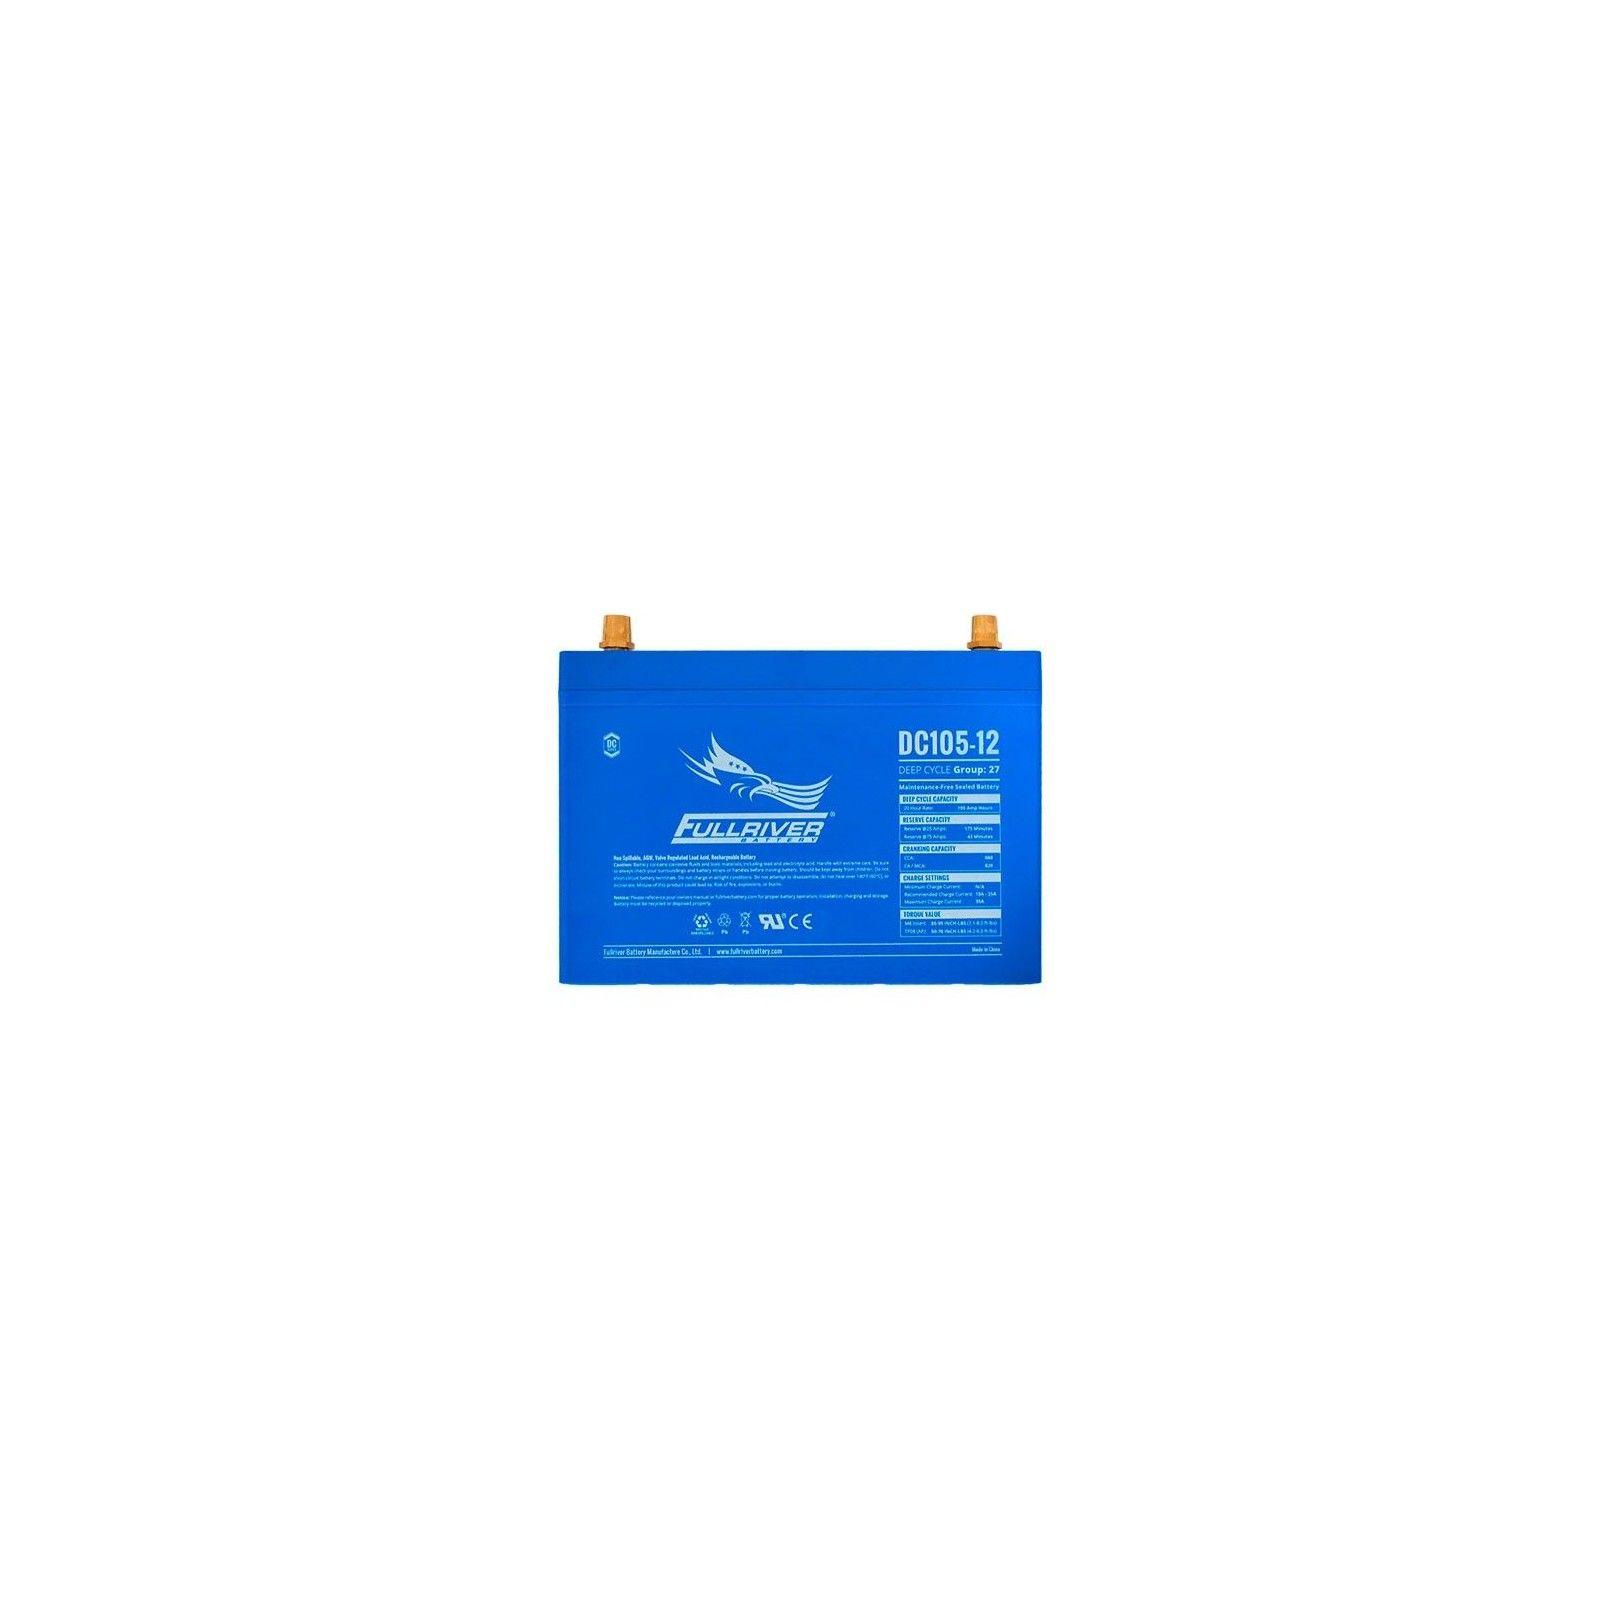 Battery Fullriver DC105-12 105Ah 550A 12V Dc FULLRIVER - 1